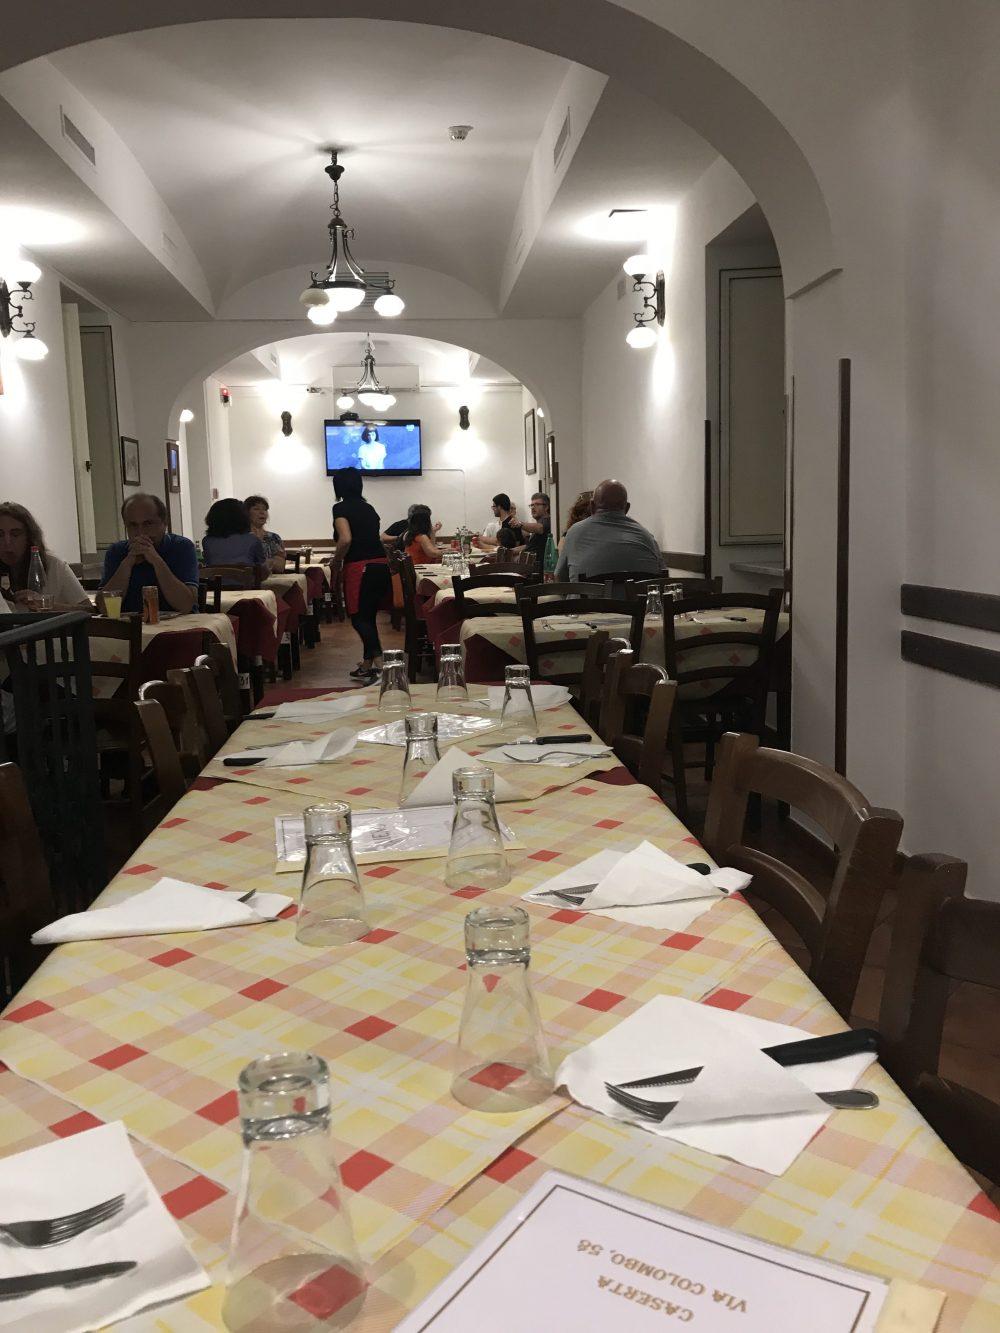 Pizzeria La Loggetta - Sala interna